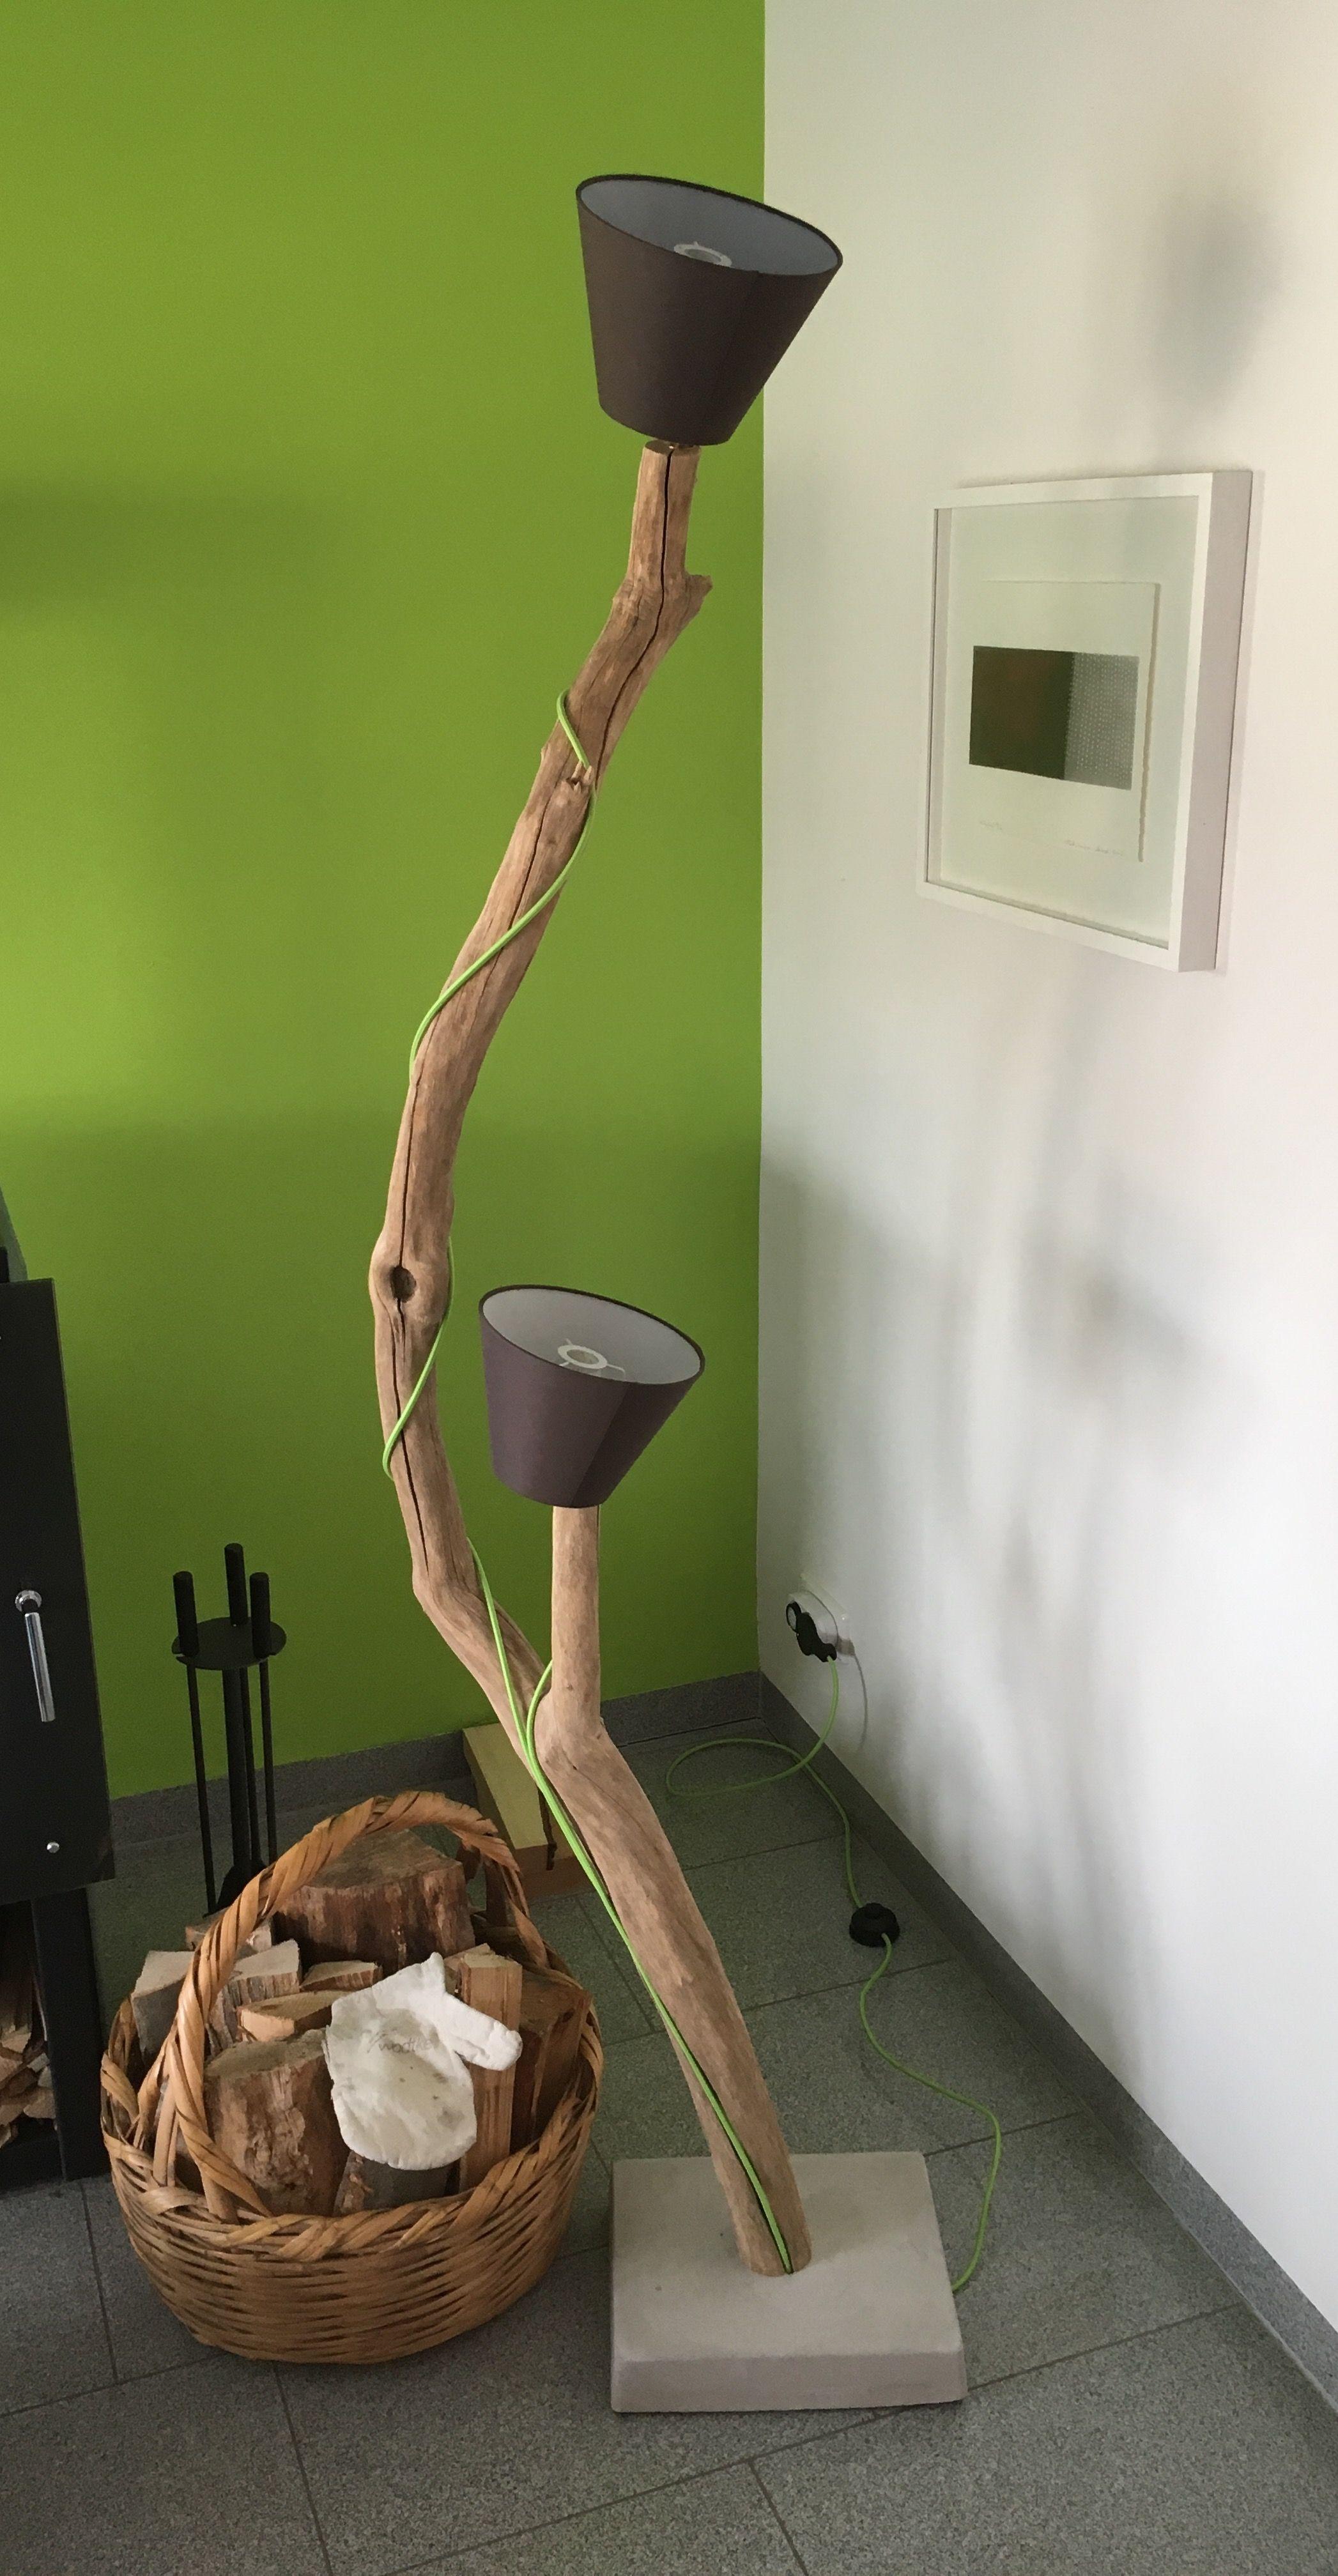 Treibholz Stehlampe Treibholz Selbermachen Kreative Ideen